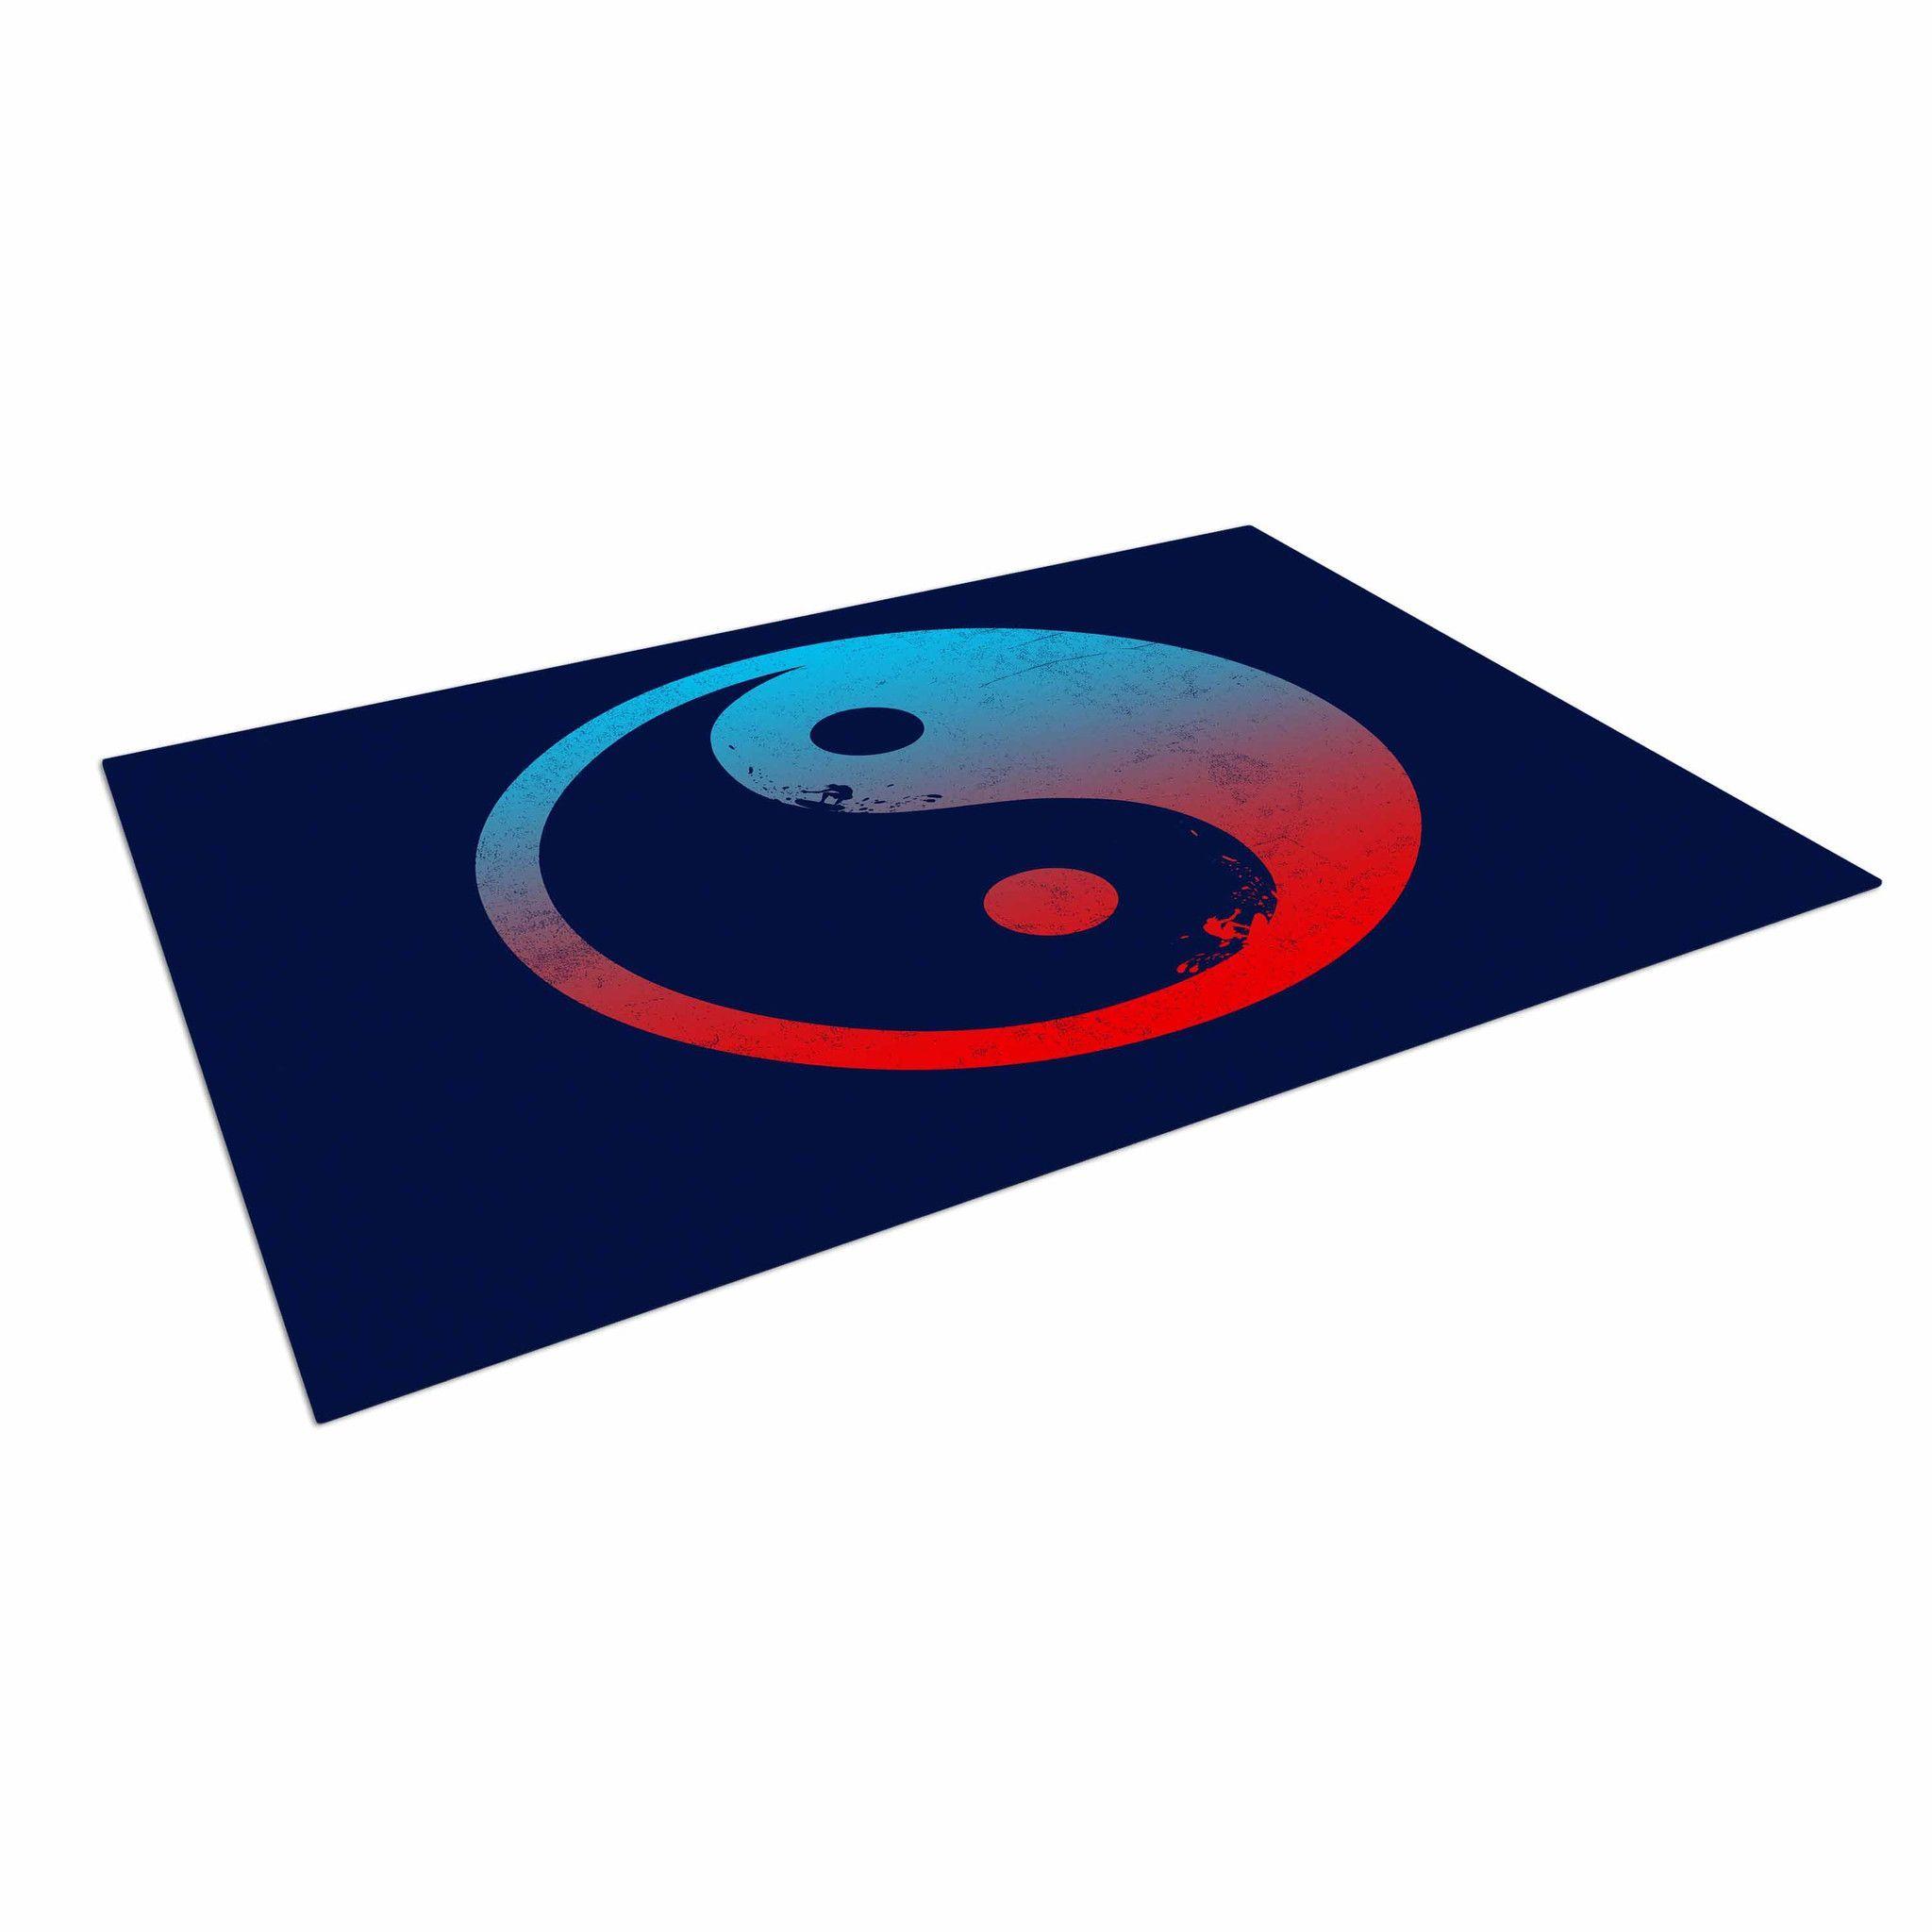 "Federic Levy-Hadida ""Ying Yang Surfers"" Red Blue Indoor / Outdoor Floor Mat"